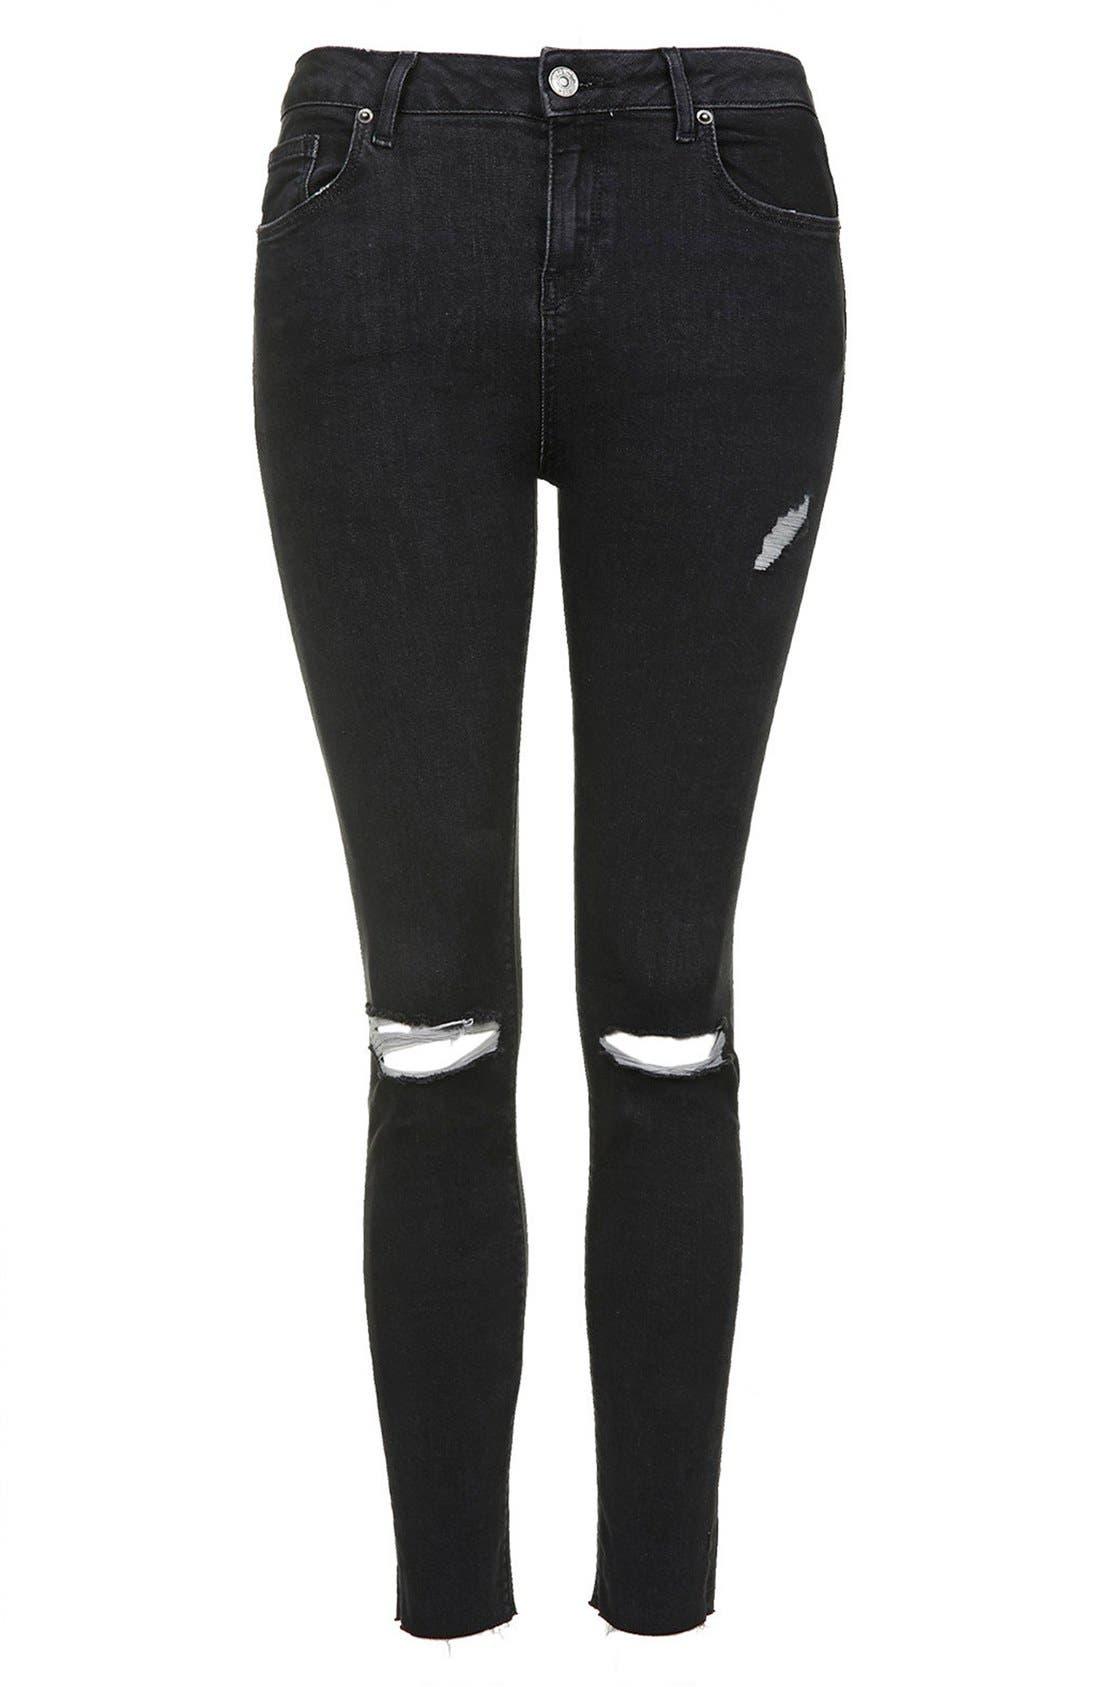 Alternate Image 3  - Topshop 'Jamie' Ripped Skinny Jeans (Black) (Petite)